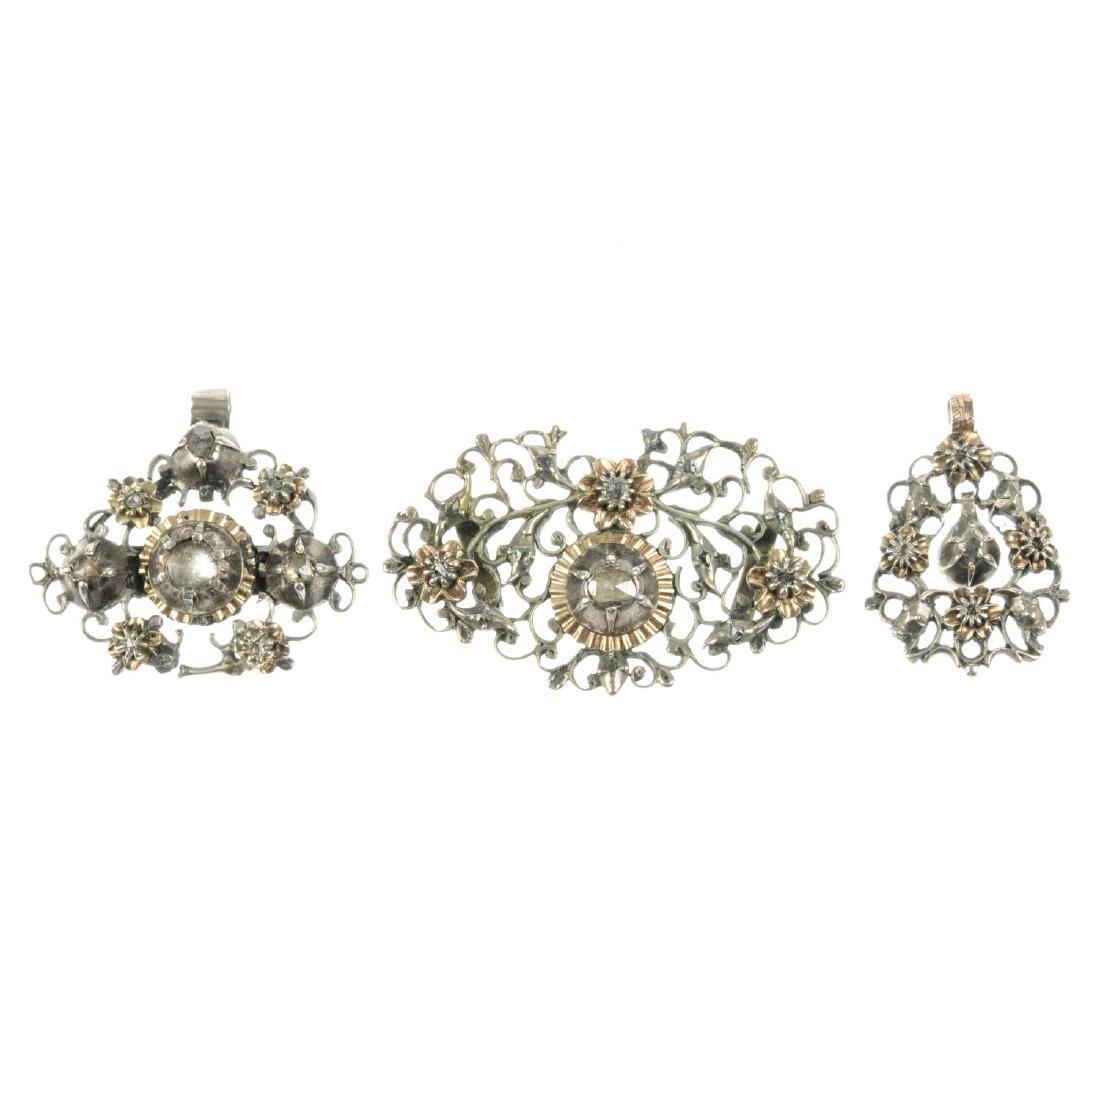 A diamond slider and two diamond pendants. The slider